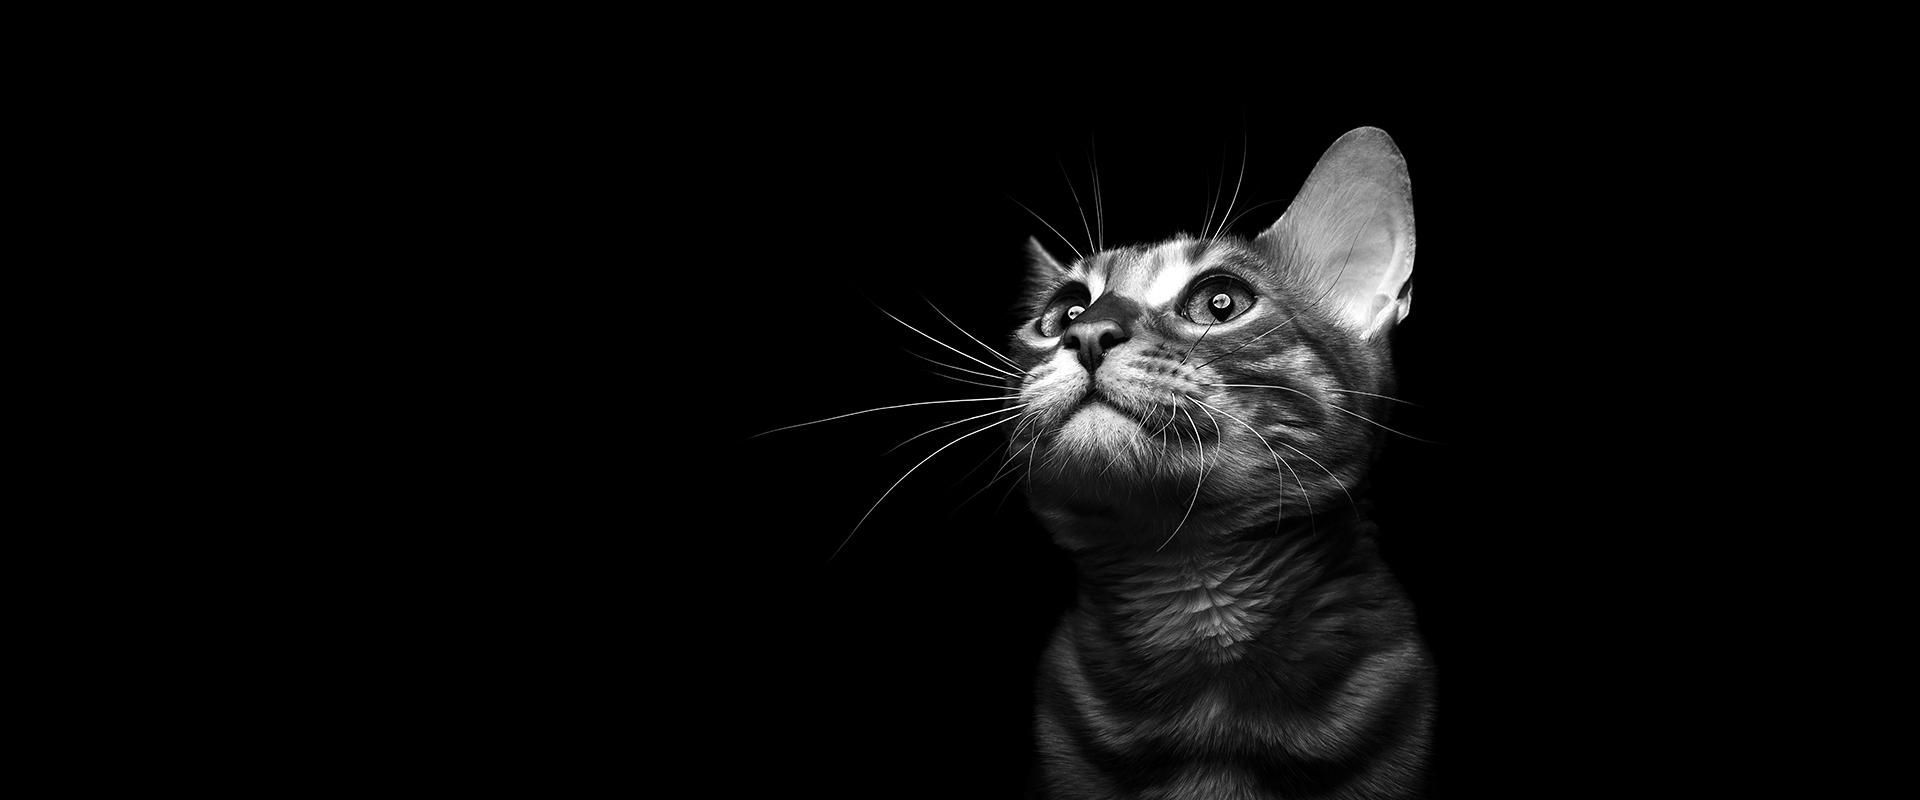 slider-cat